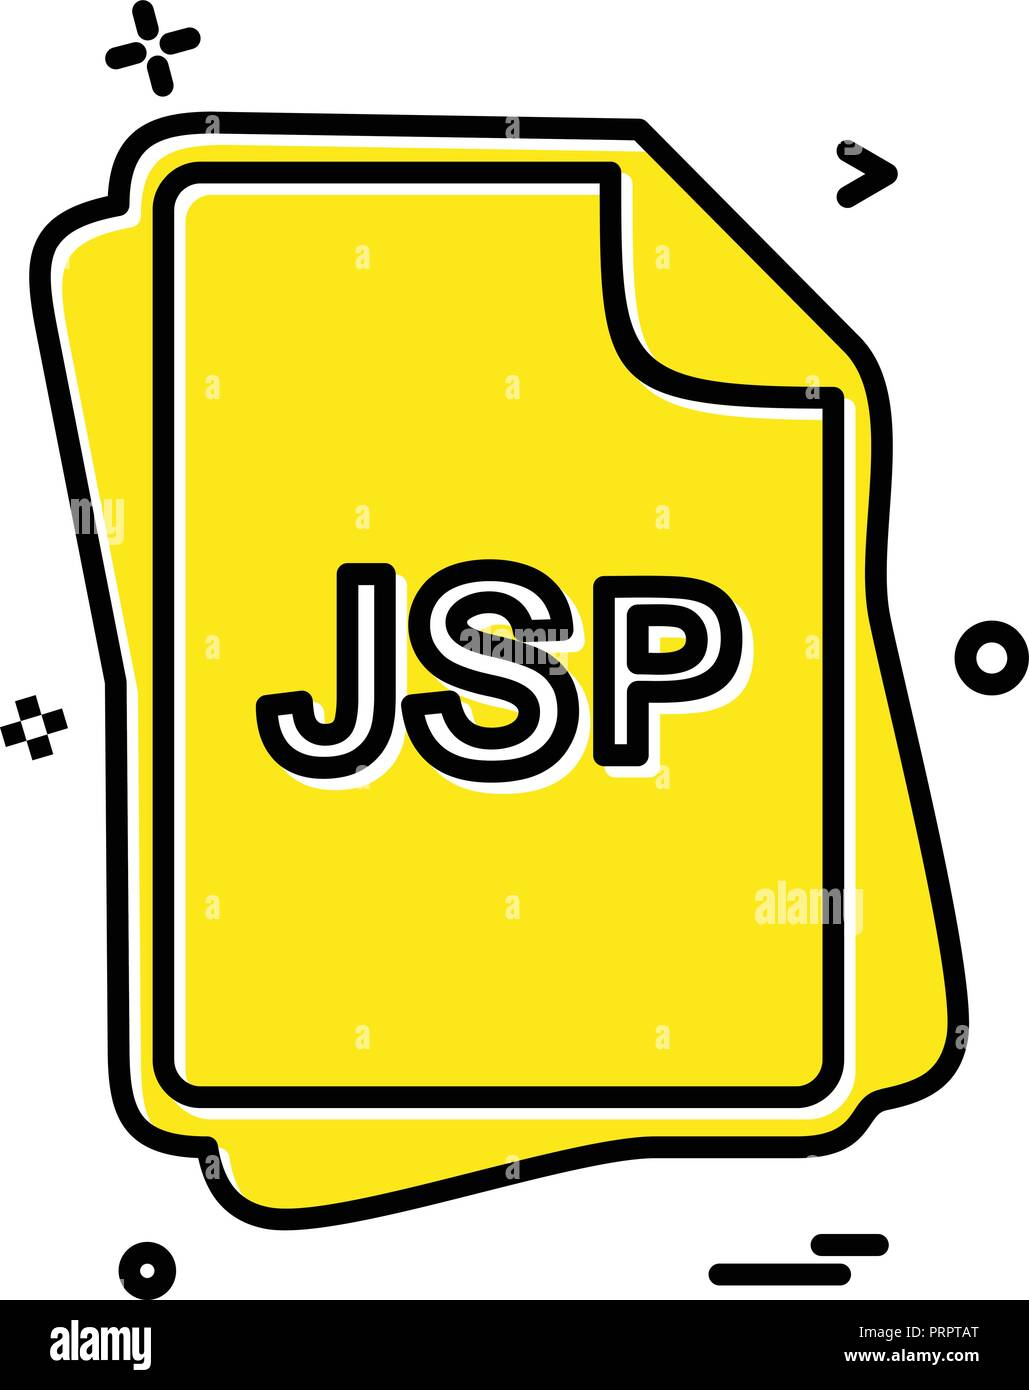 JSP file type icon design vector - Stock Image